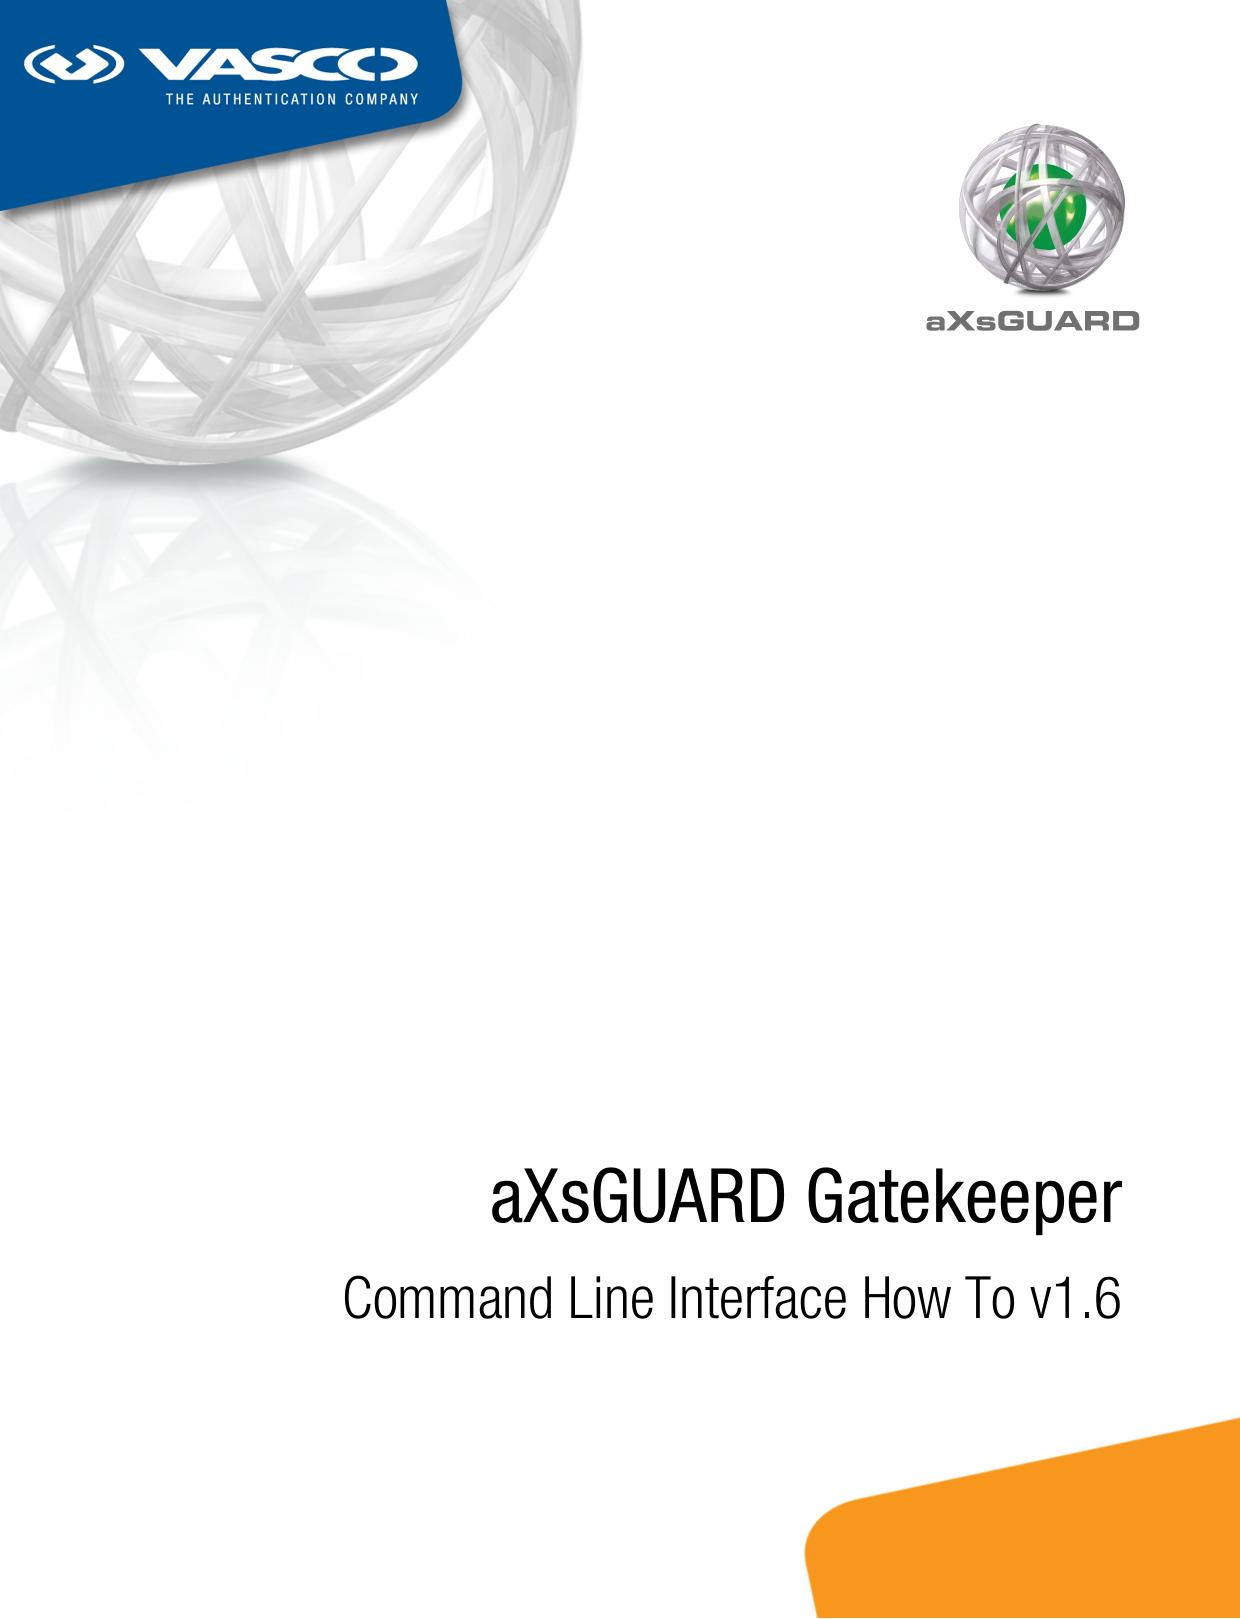 aXsGUARD Gatekeeper - VASCO Data Security | manualzz com